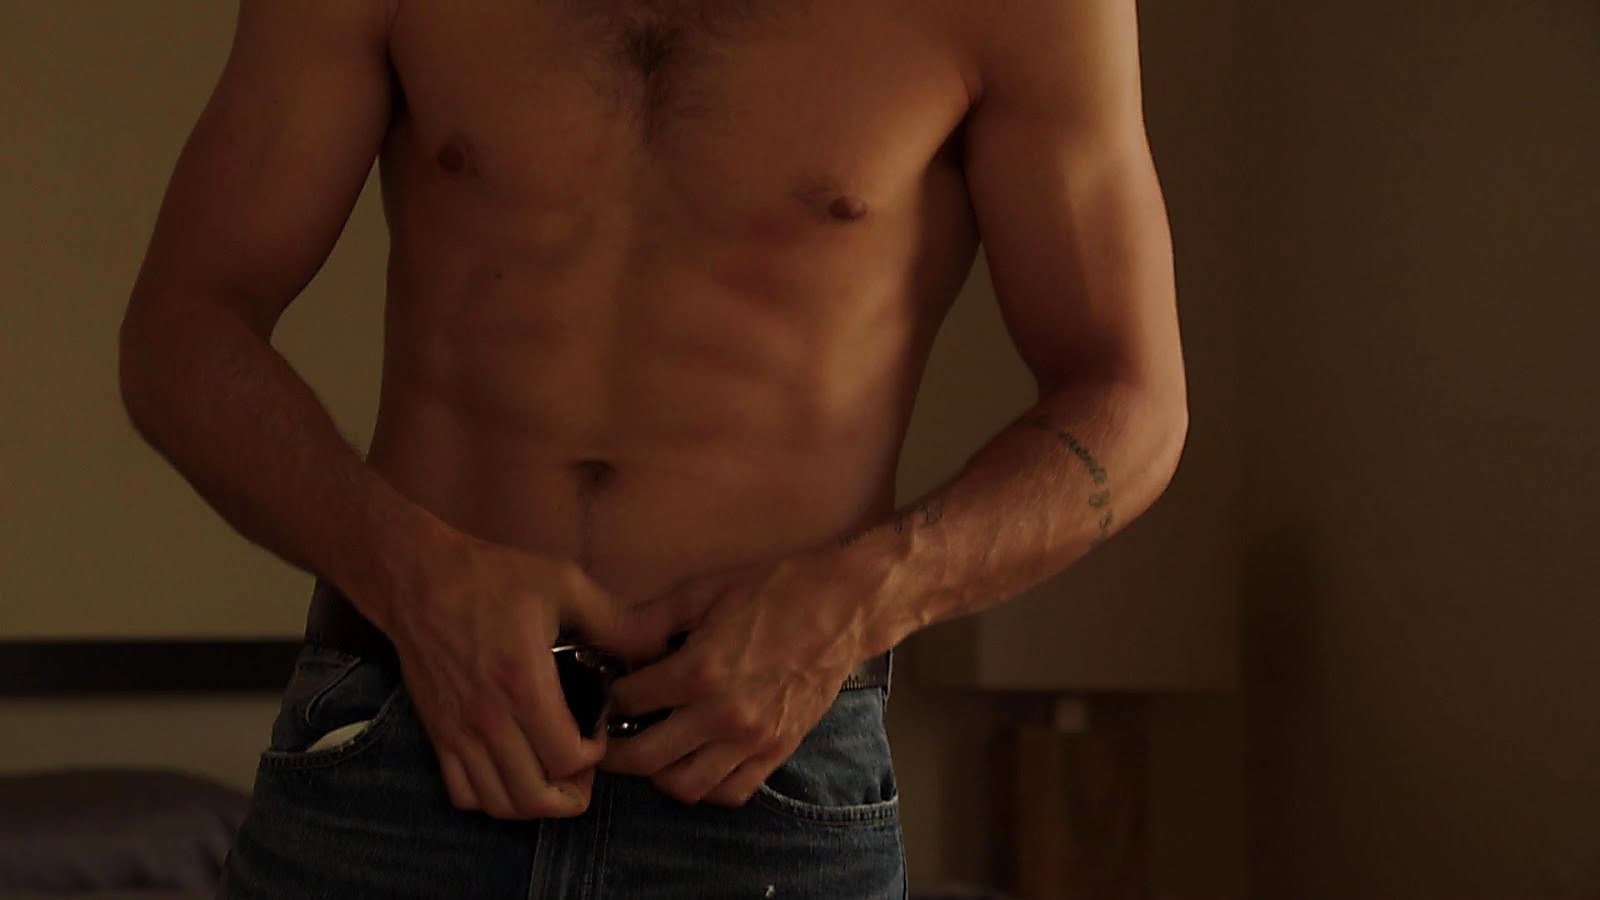 Ryan Guzman sexy shirtless scene October 9, 2018, 12pm